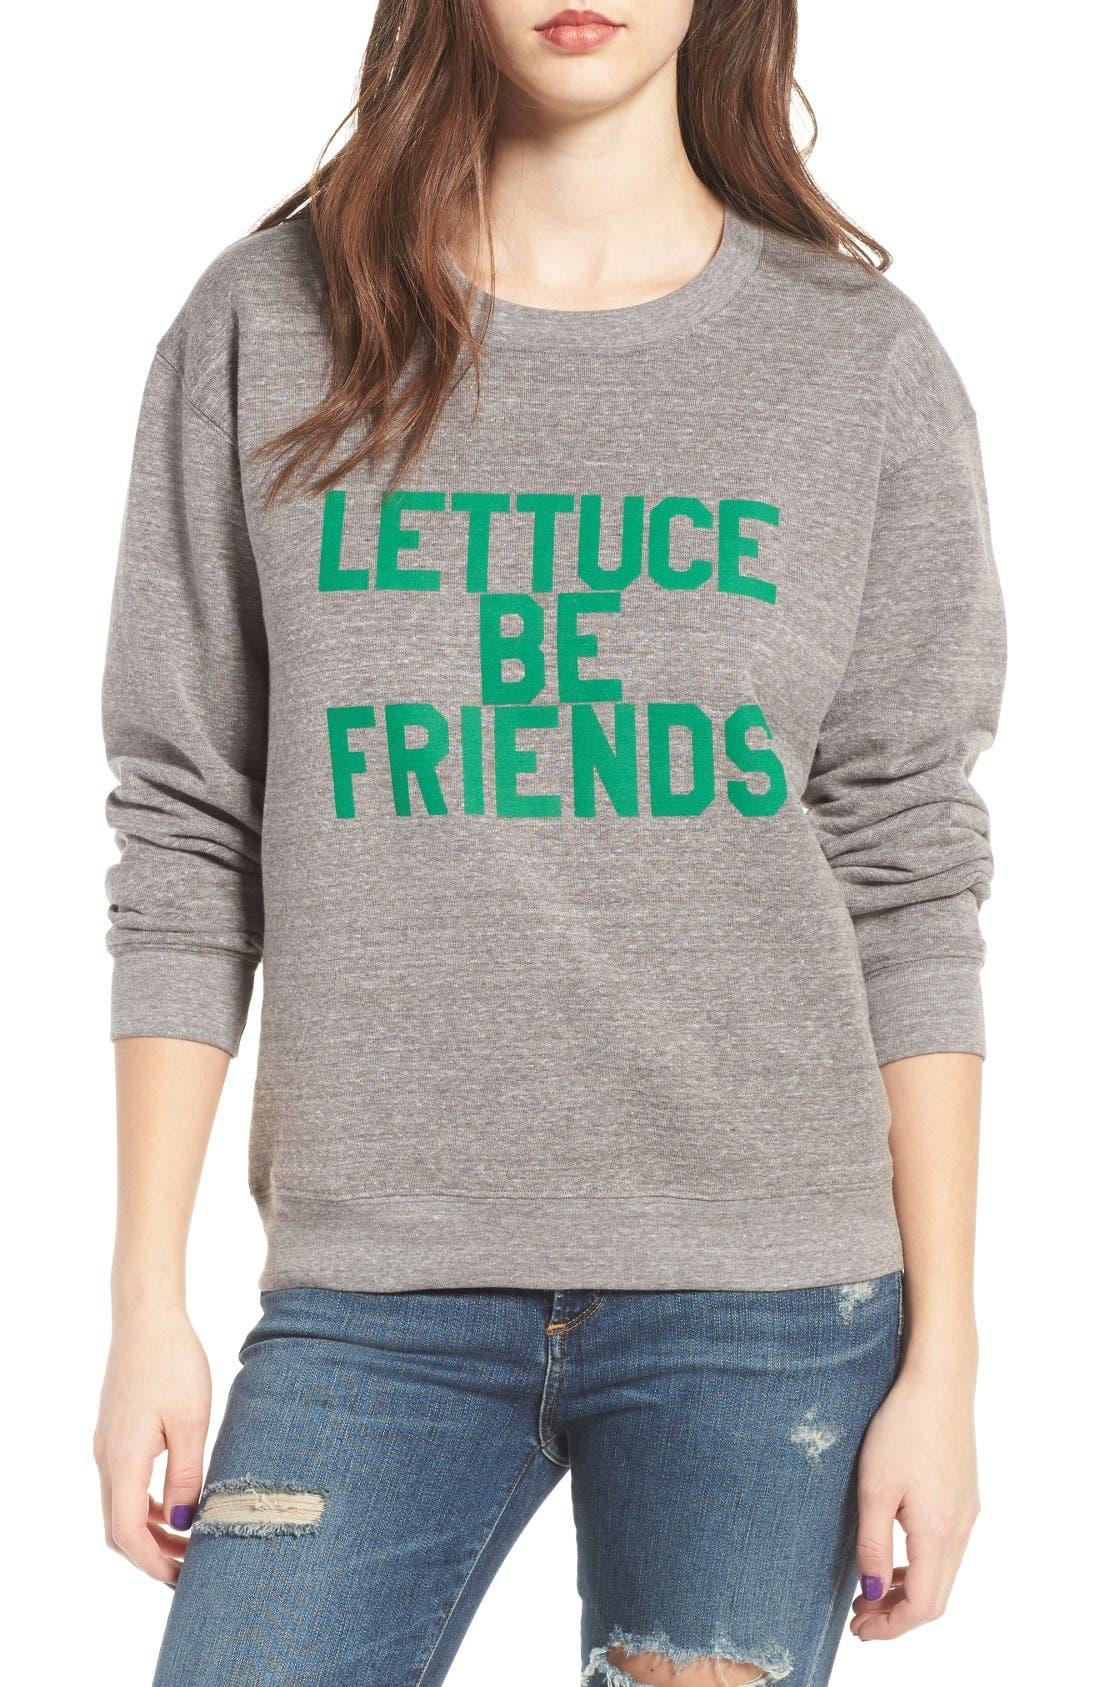 Lettuce Be Friends Sweatshirt,                             Main thumbnail 1, color,                             Heather Grey